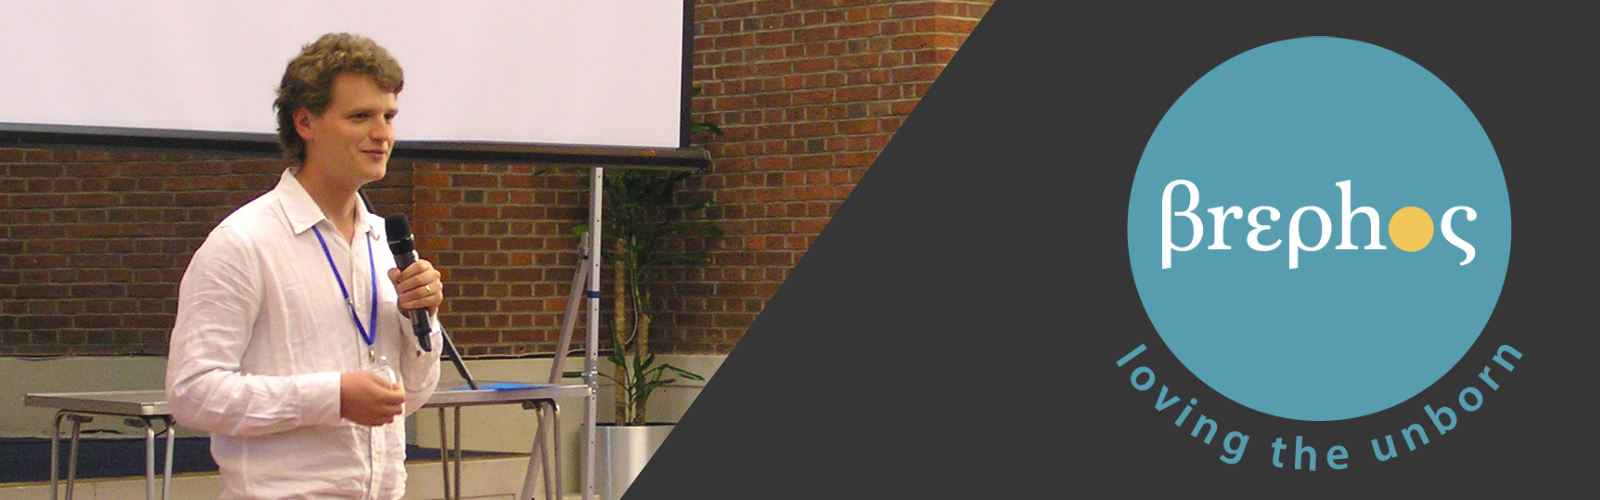 Dave Brennan and Brephos logo banner